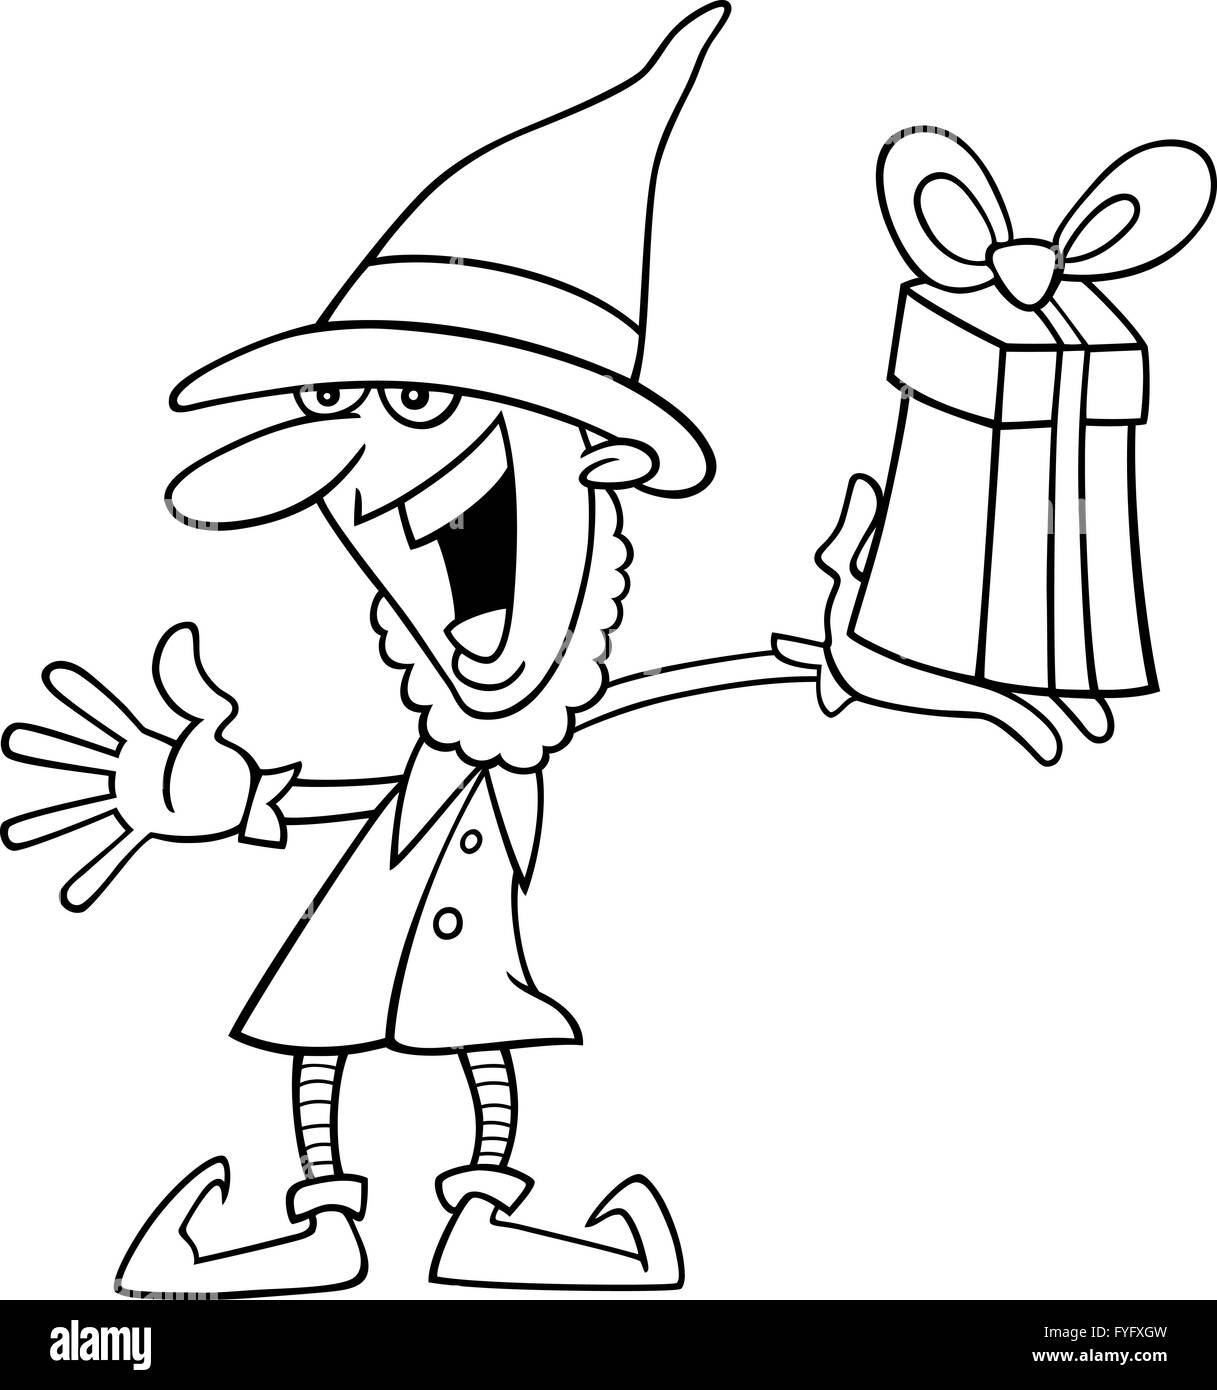 Excepcional Buddy The Elf Para Colorear Ornamento - Dibujos Para ...